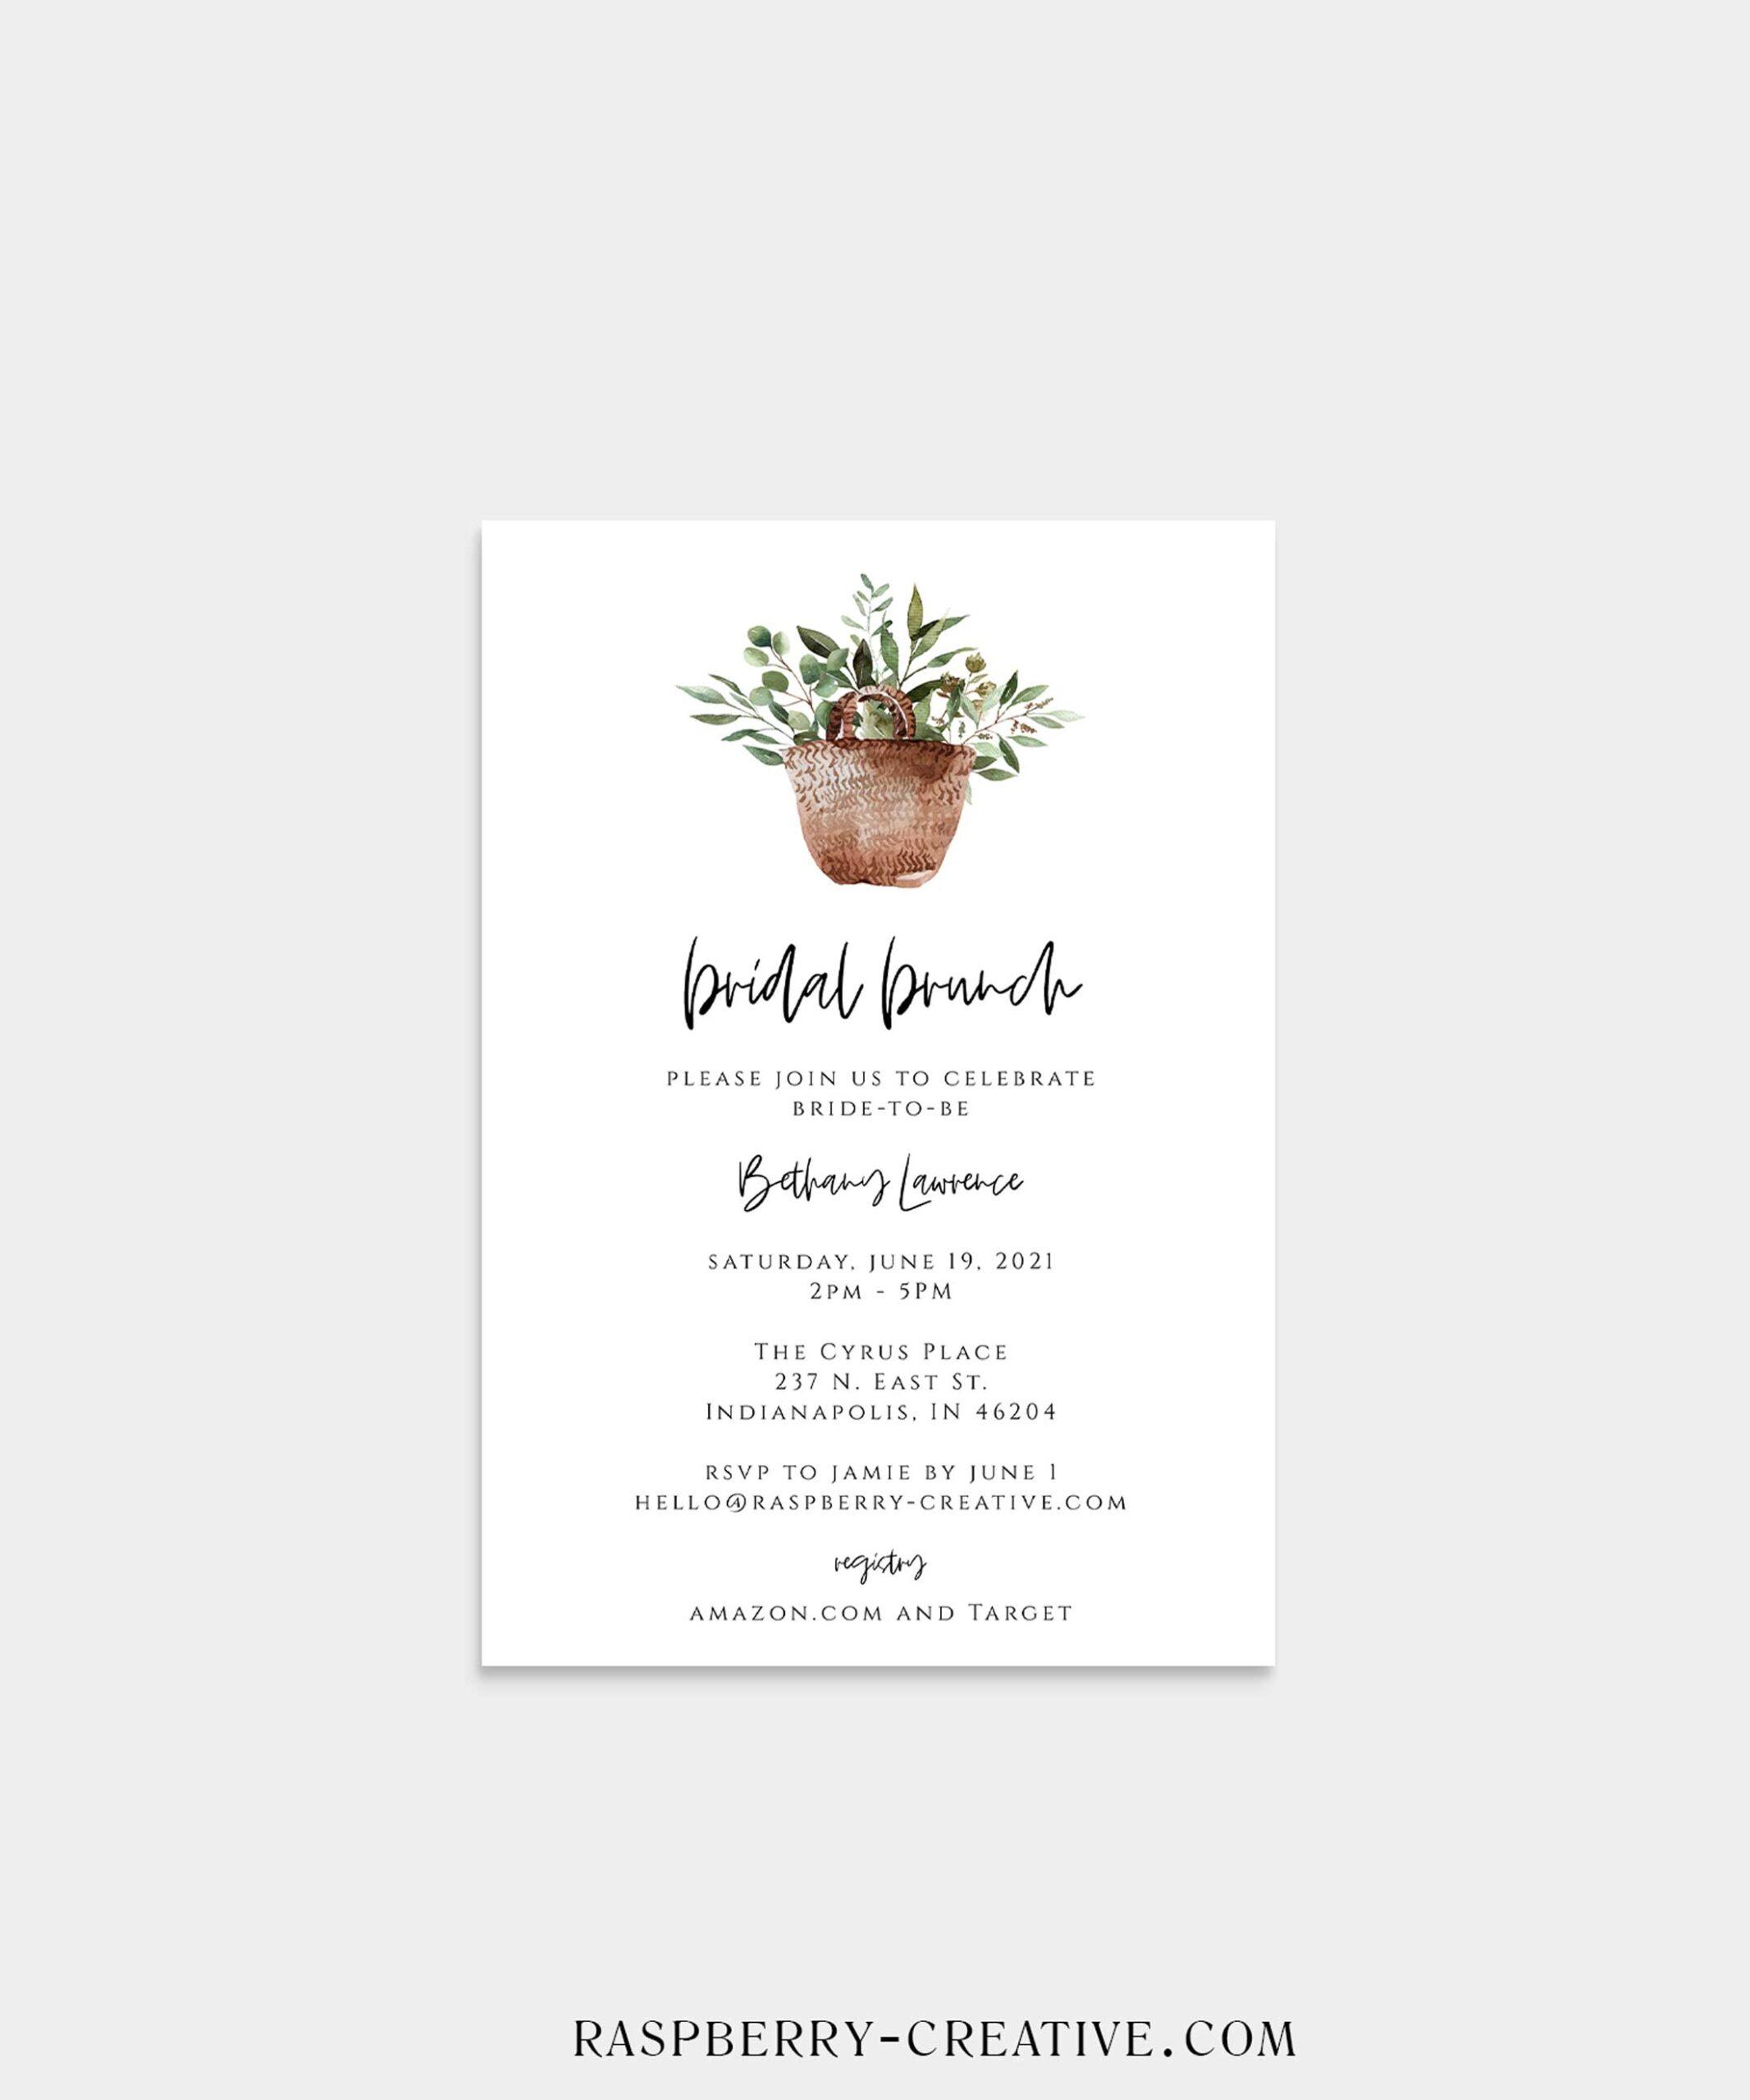 greenery bridal brunch shower invitation